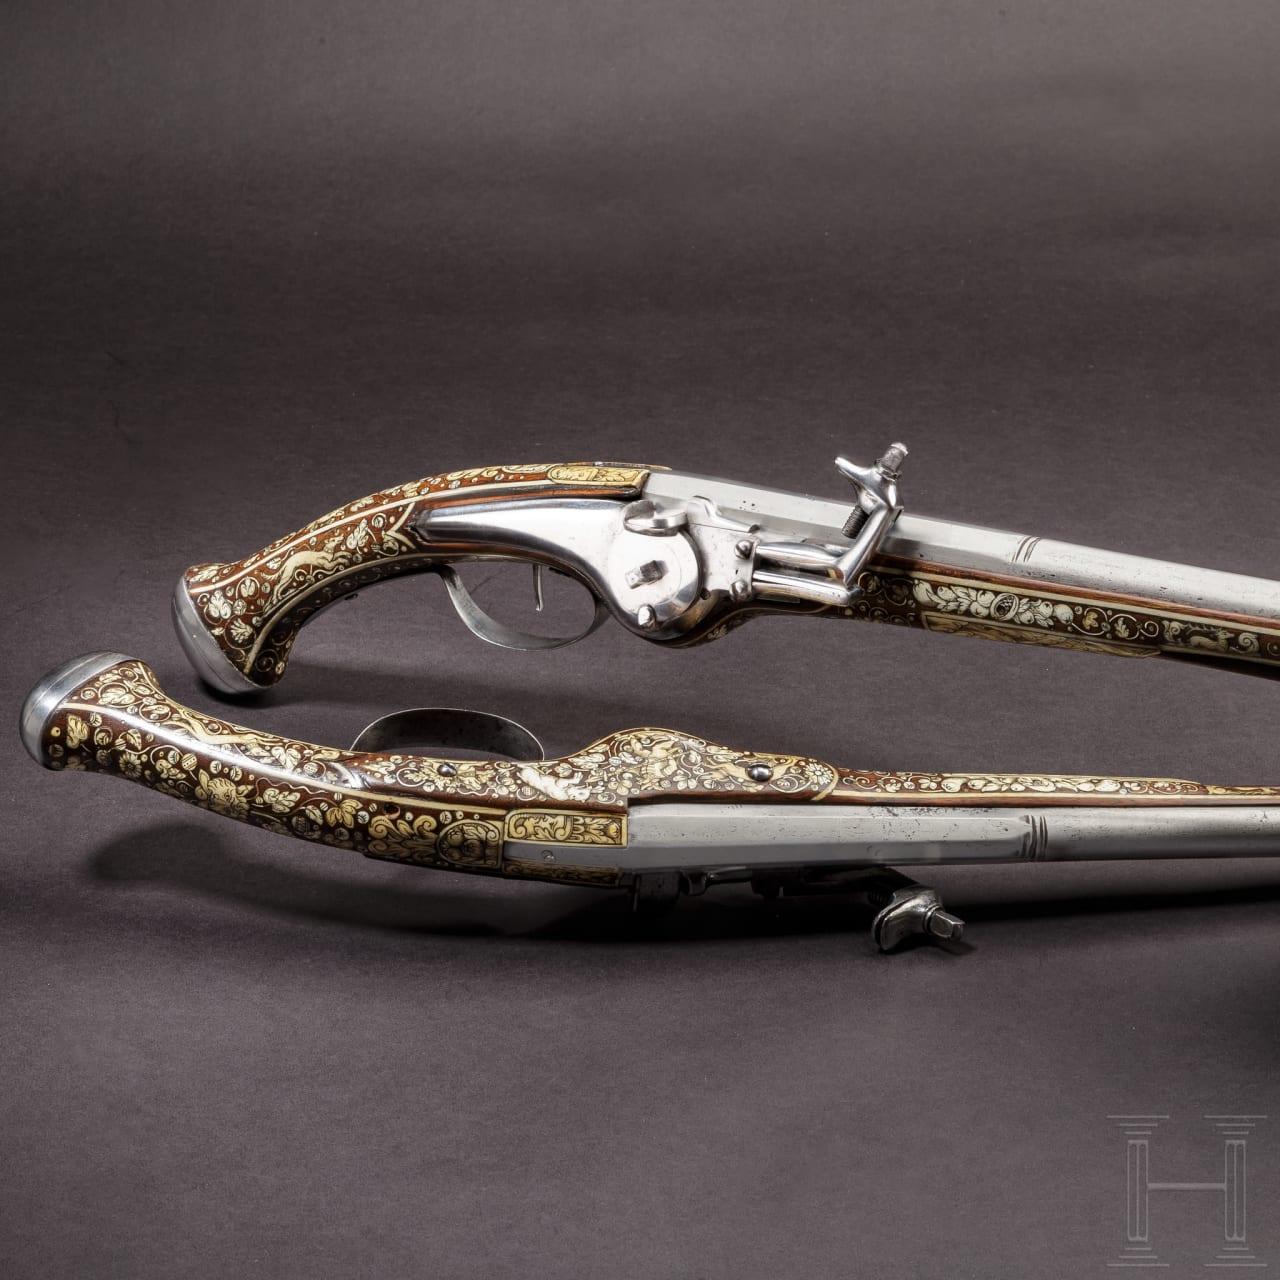 A pair of long bone-inlaid wheellock pistols, Teschen, circa 1630